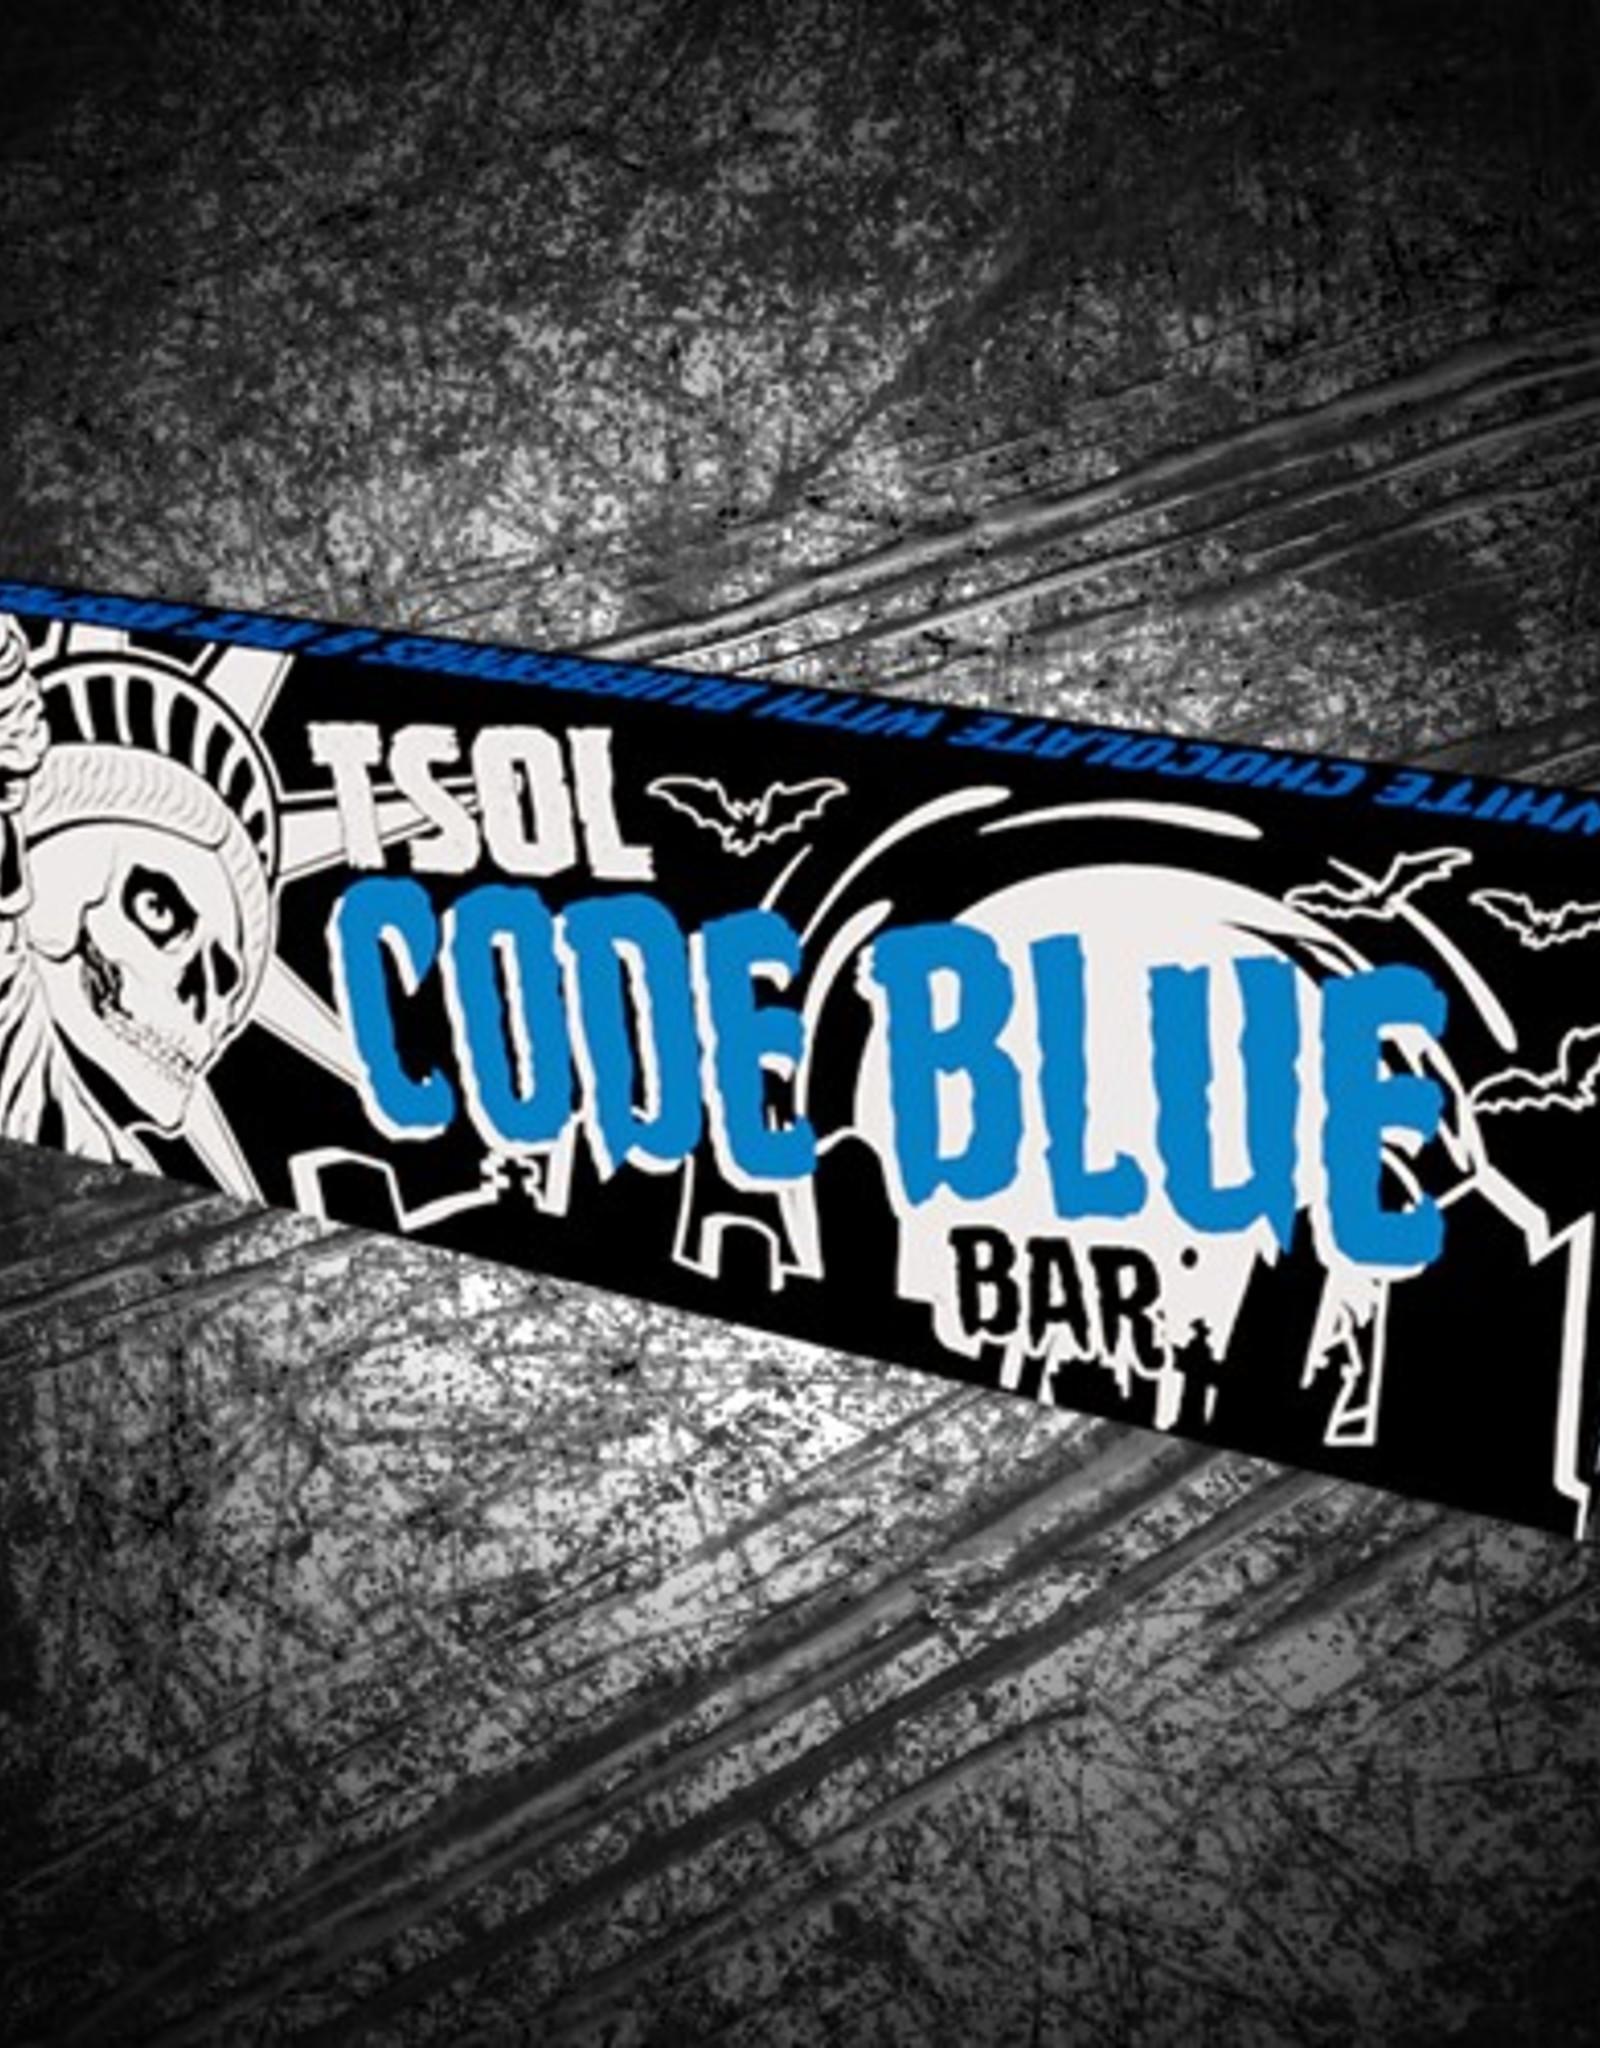 """TSOL Code Blue"" bar by Rob Kruse"